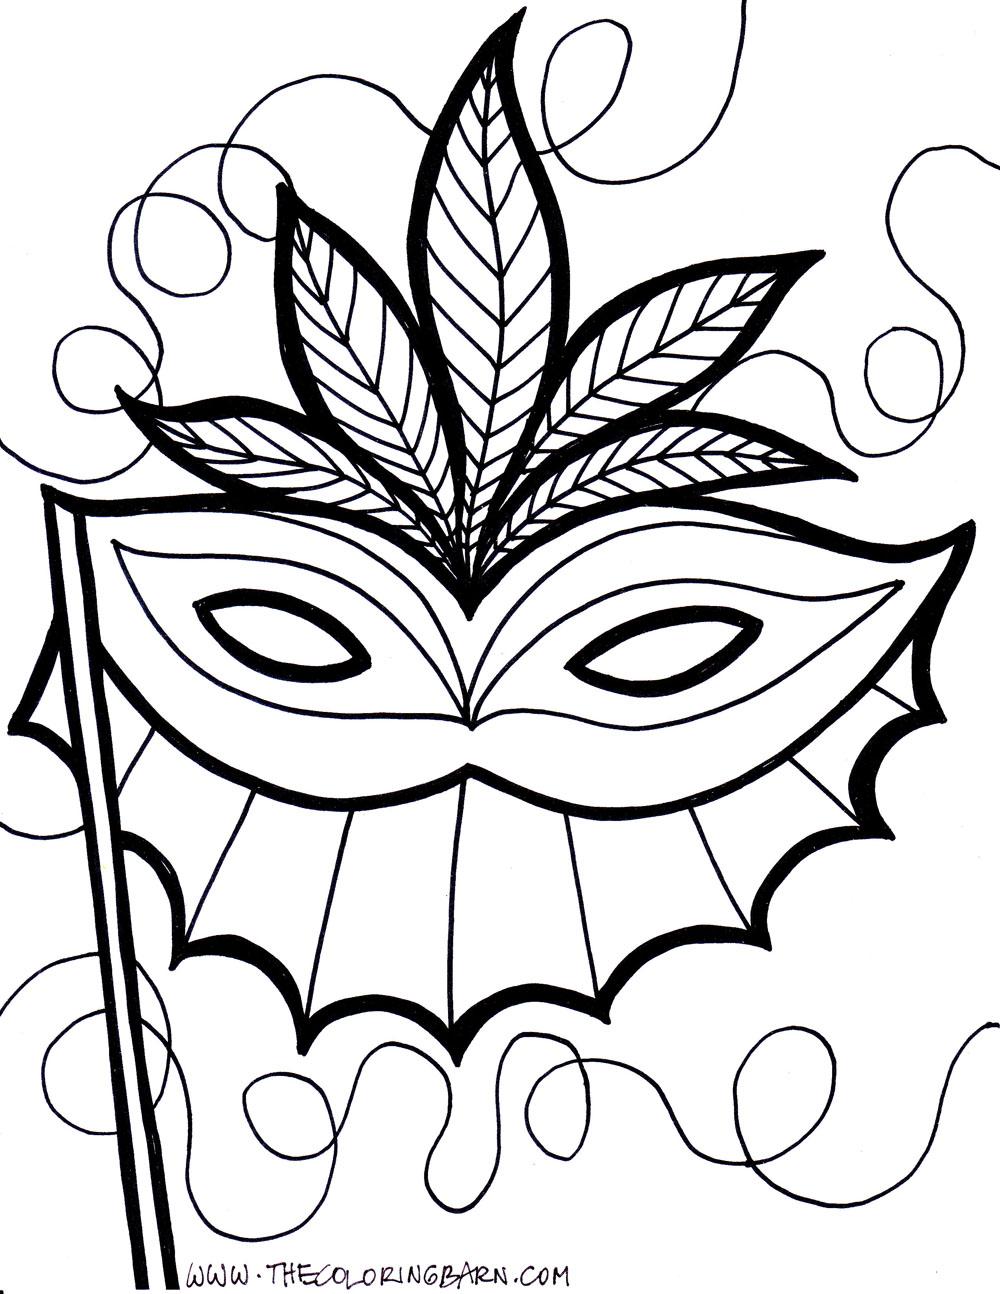 Mardi Gras Drawing at GetDrawings.com | Free for personal use Mardi ...